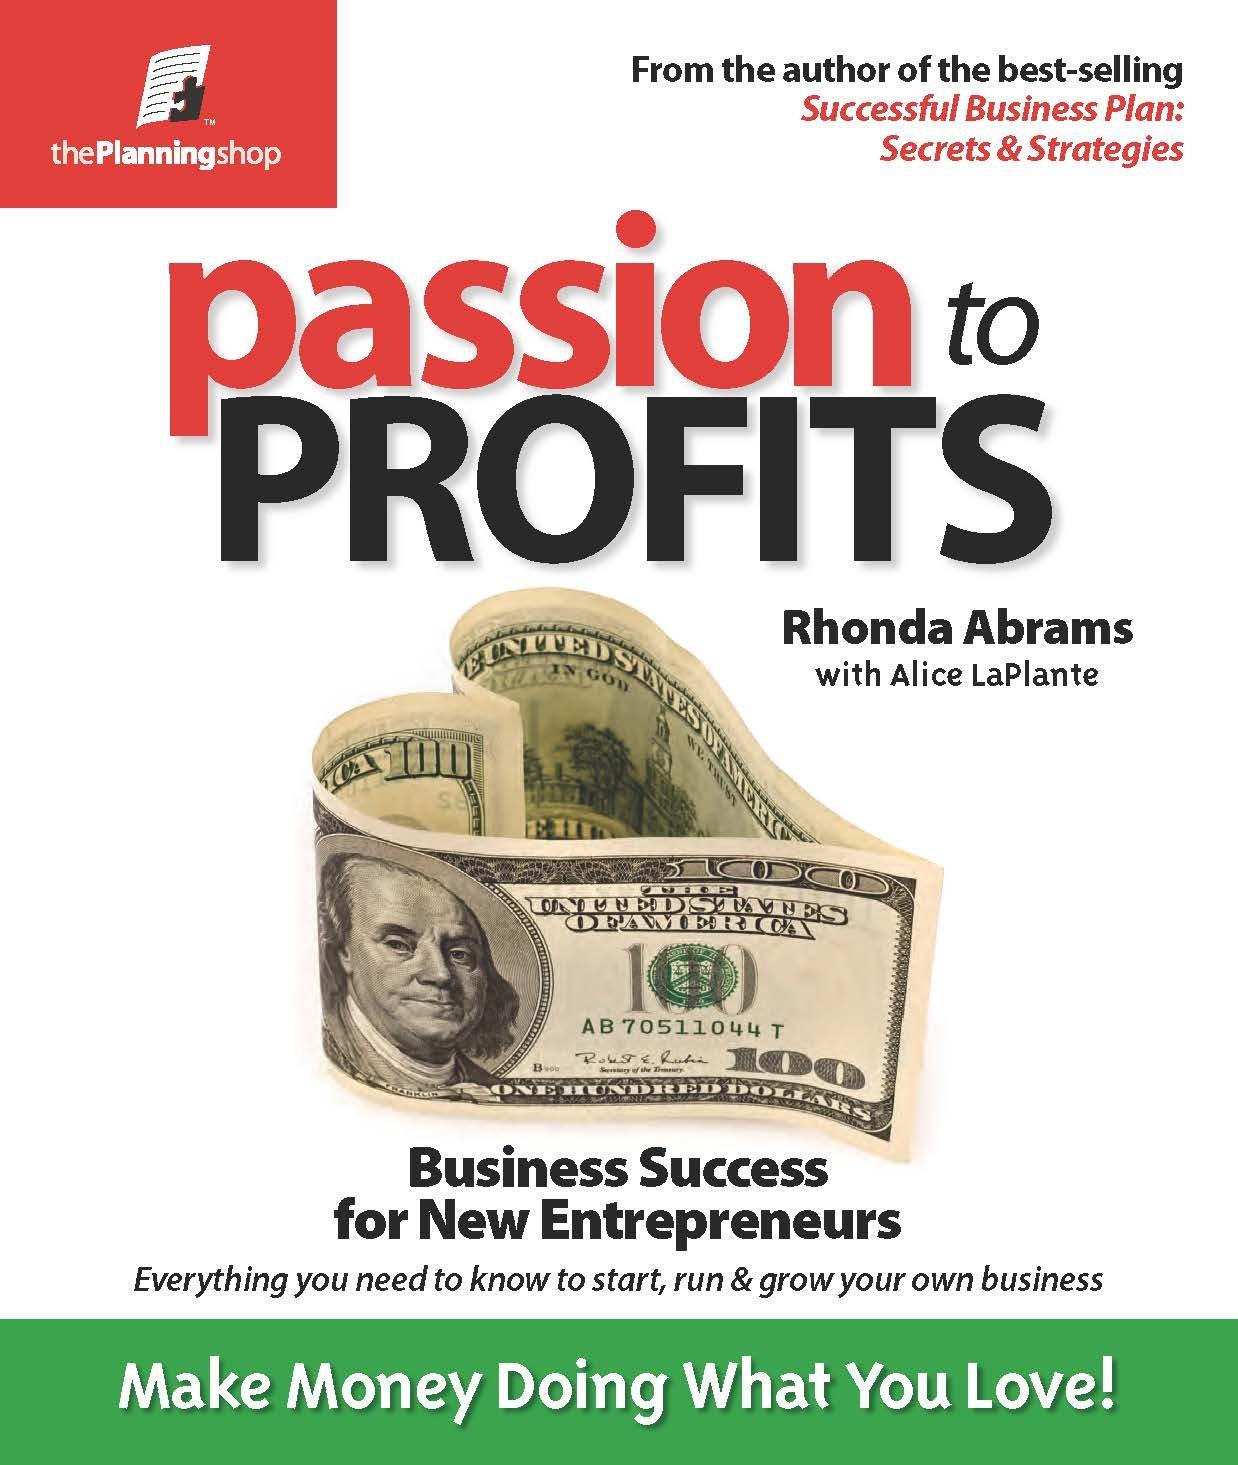 Passion to Profits: Business Success for New Entrepreneurs